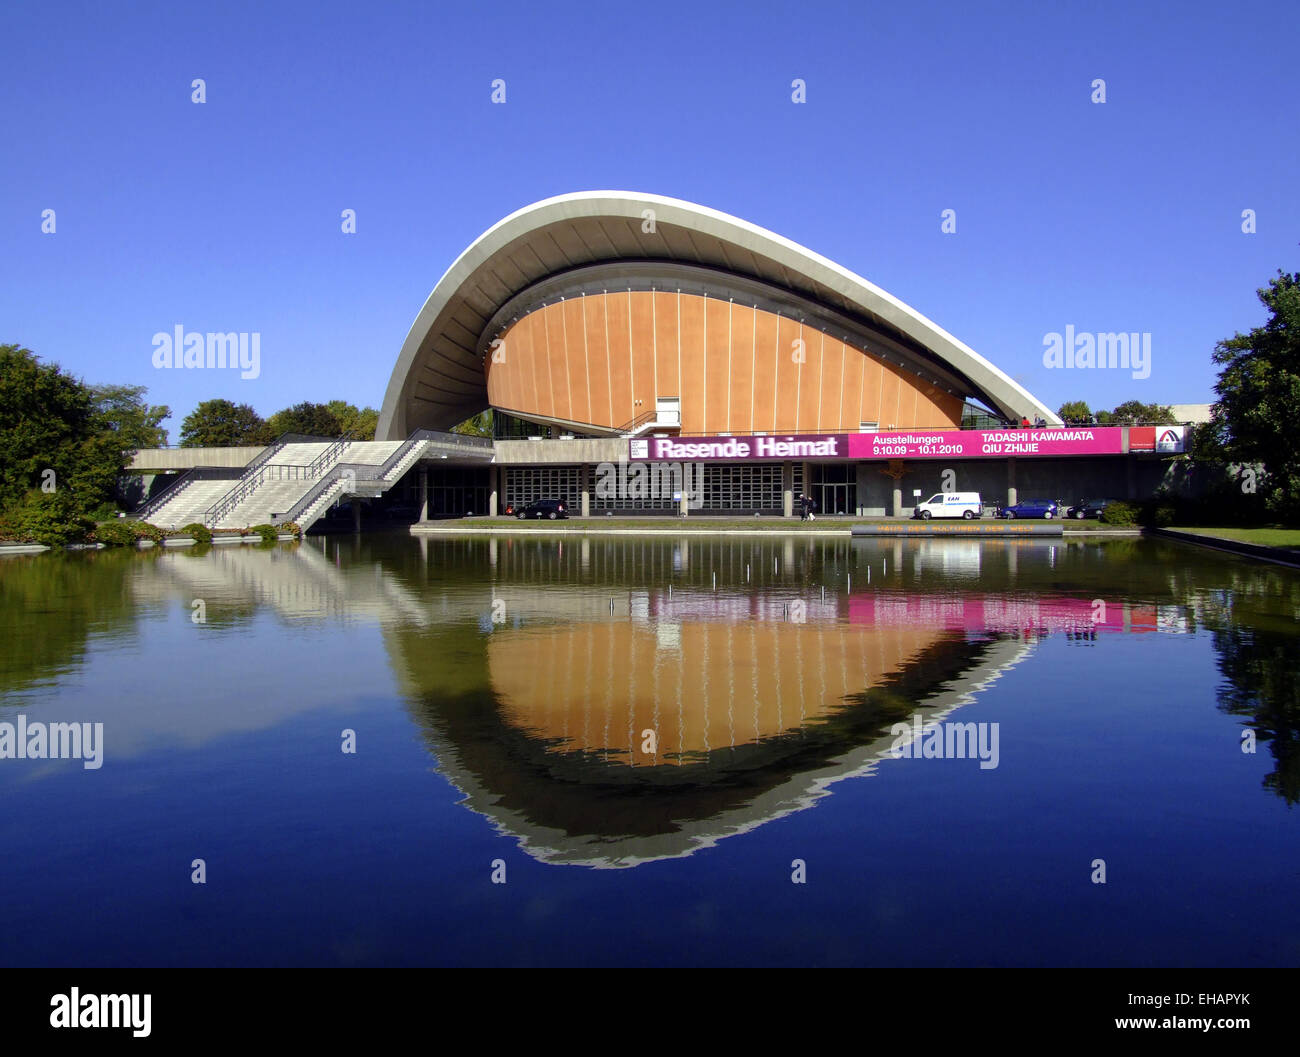 Haus der Kulturen der Welt / art gallery - Stock Image